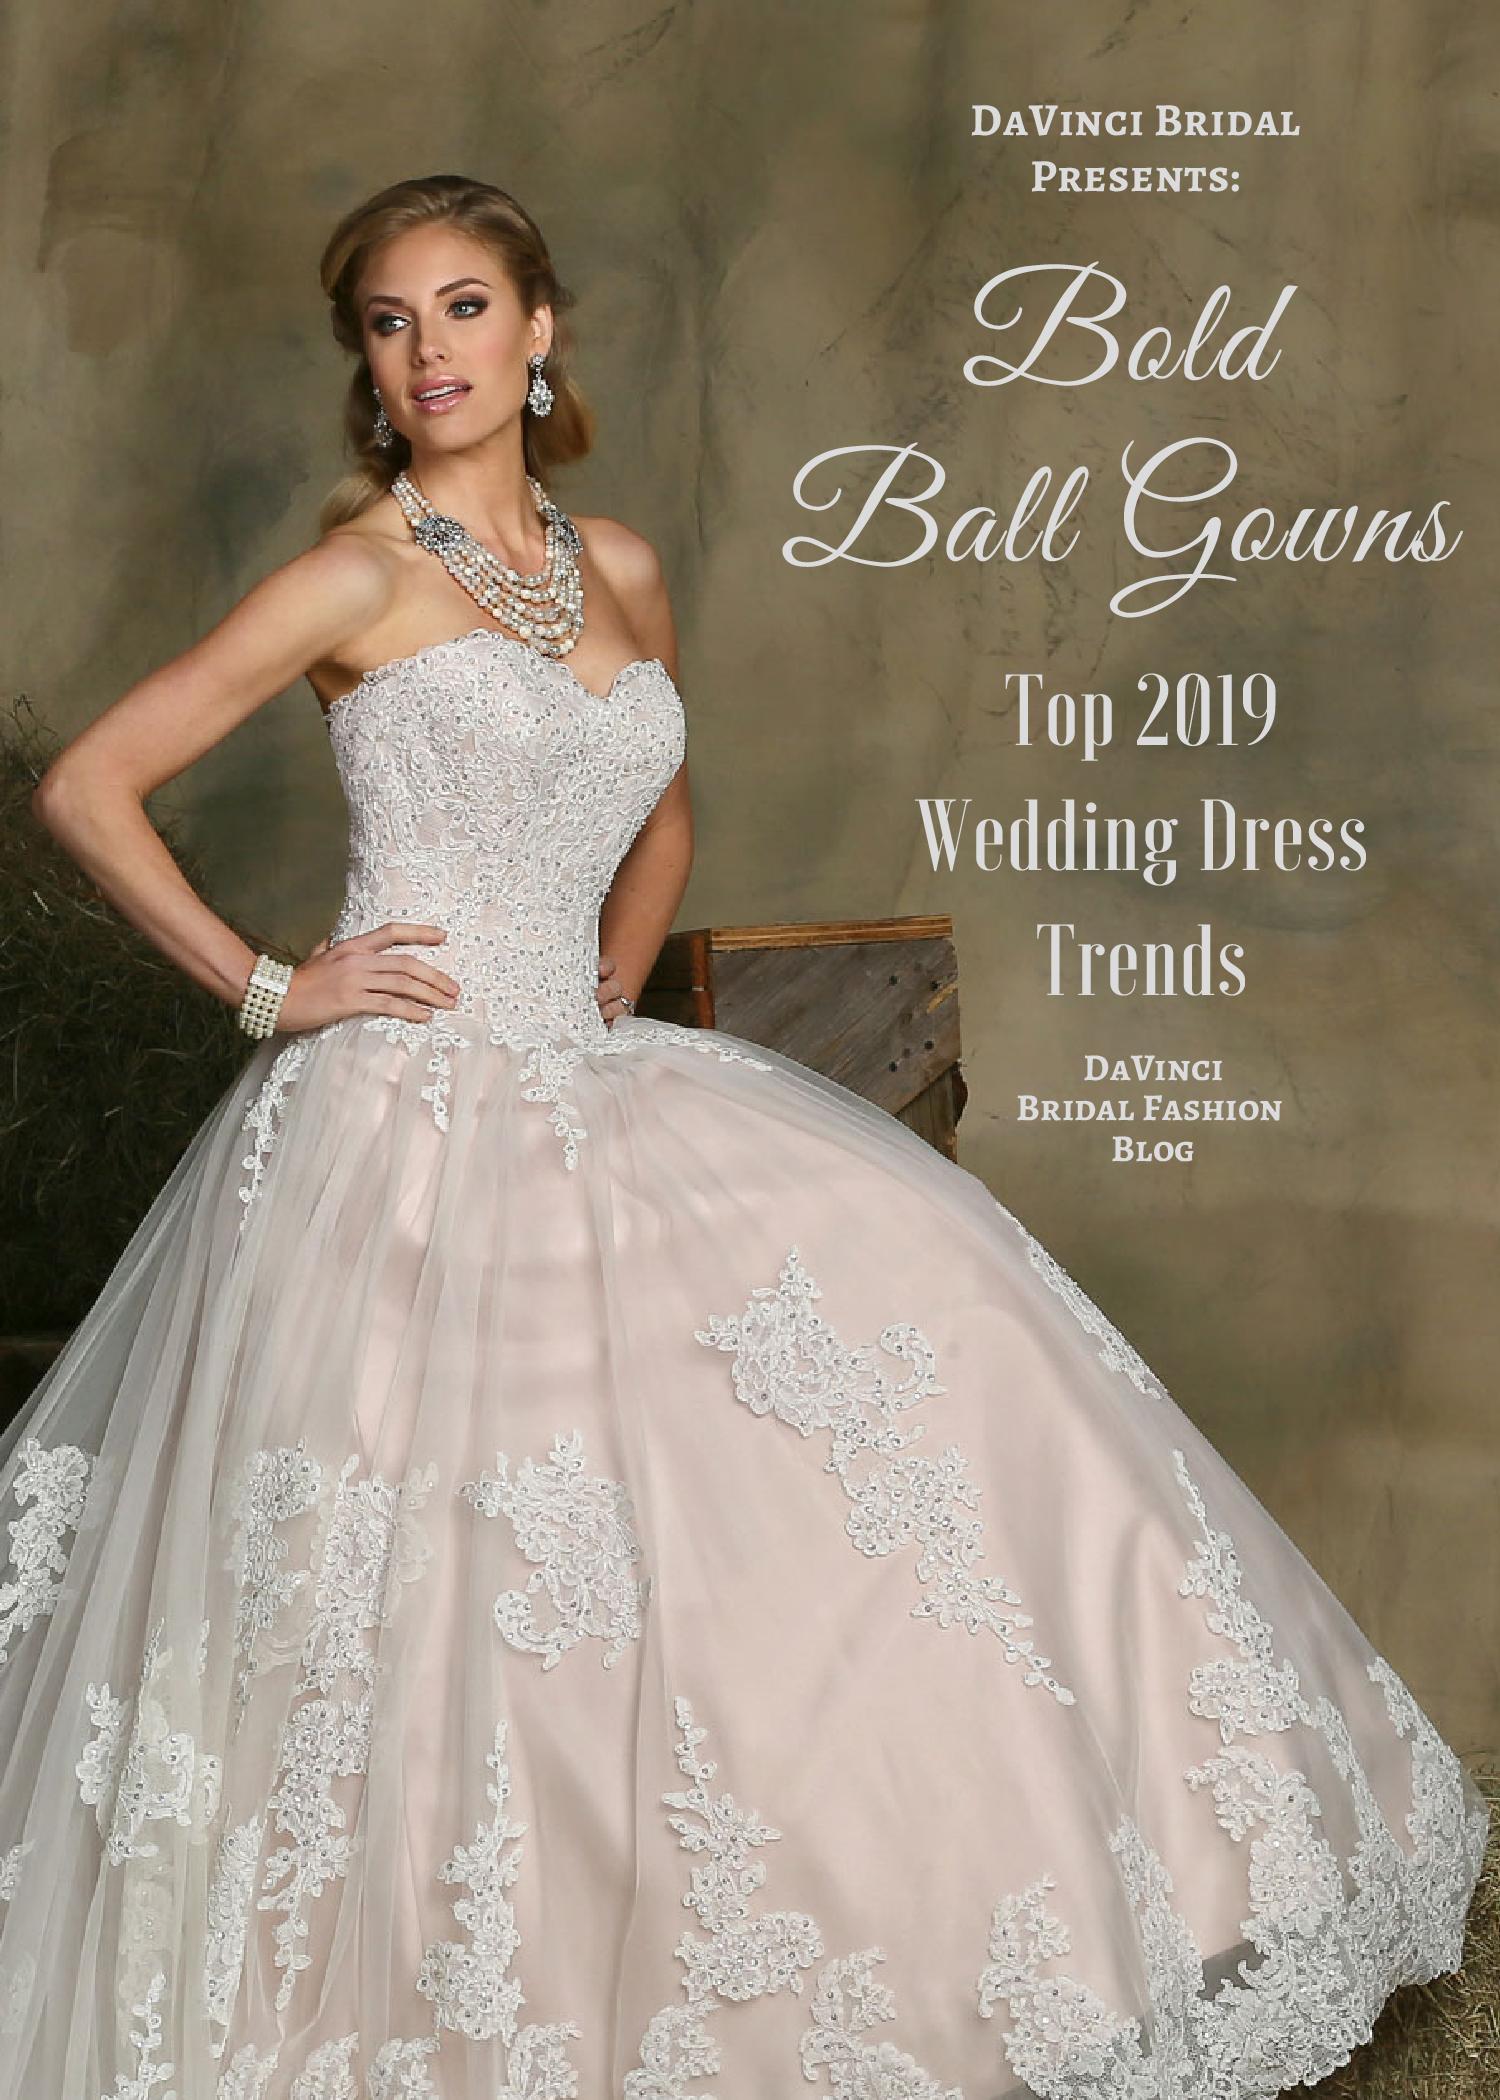 3fde8a932c5 Top 2019 Wedding Dress Trends Bold Ball Gowns – DaVinci Bridal Fashion Blog